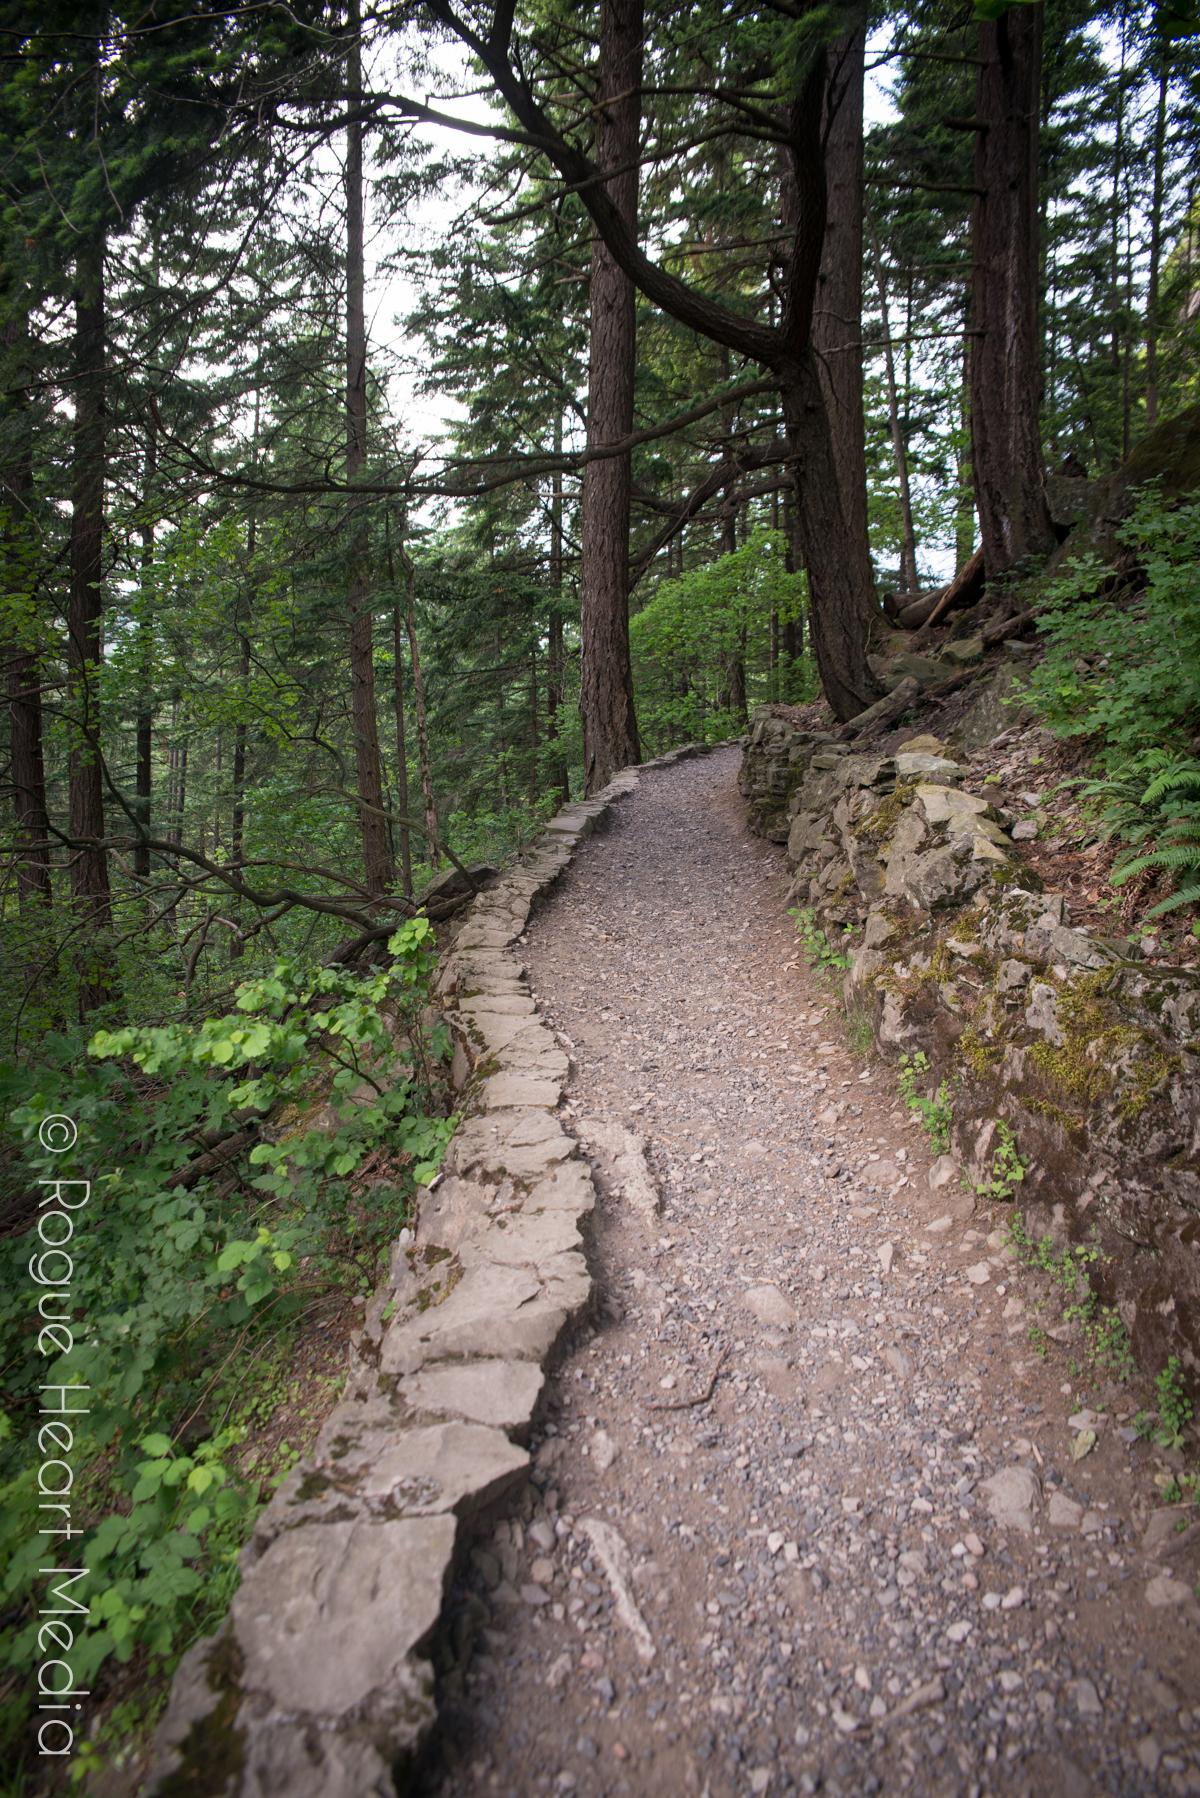 beacon rock Washington State Parks trip